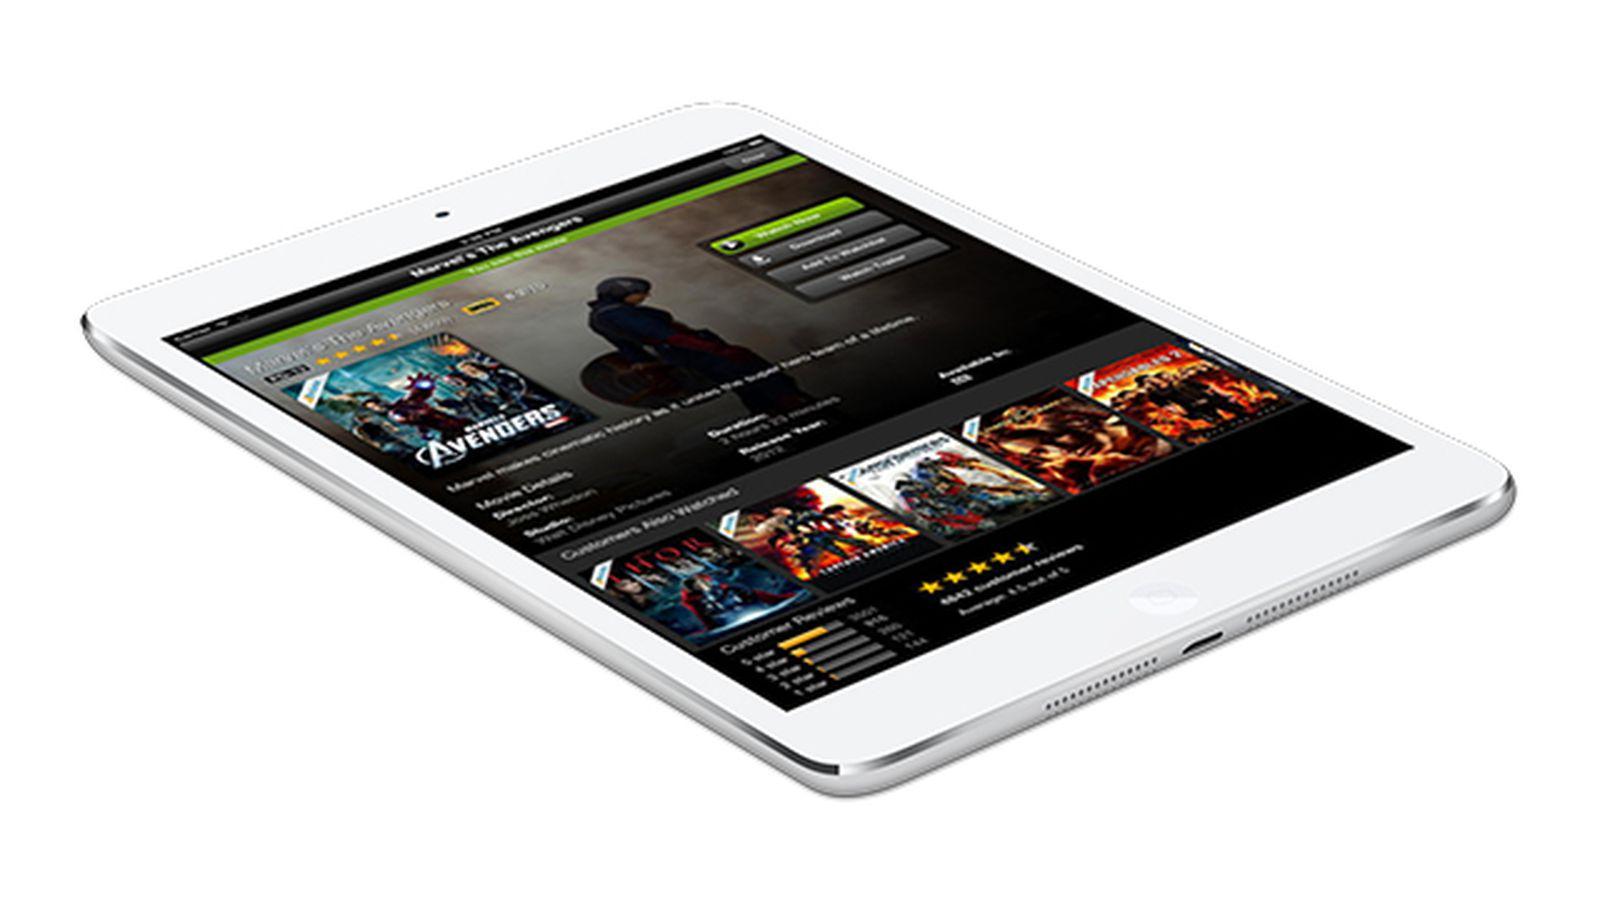 Apple TV (2nd generation) | Apple - The Verge